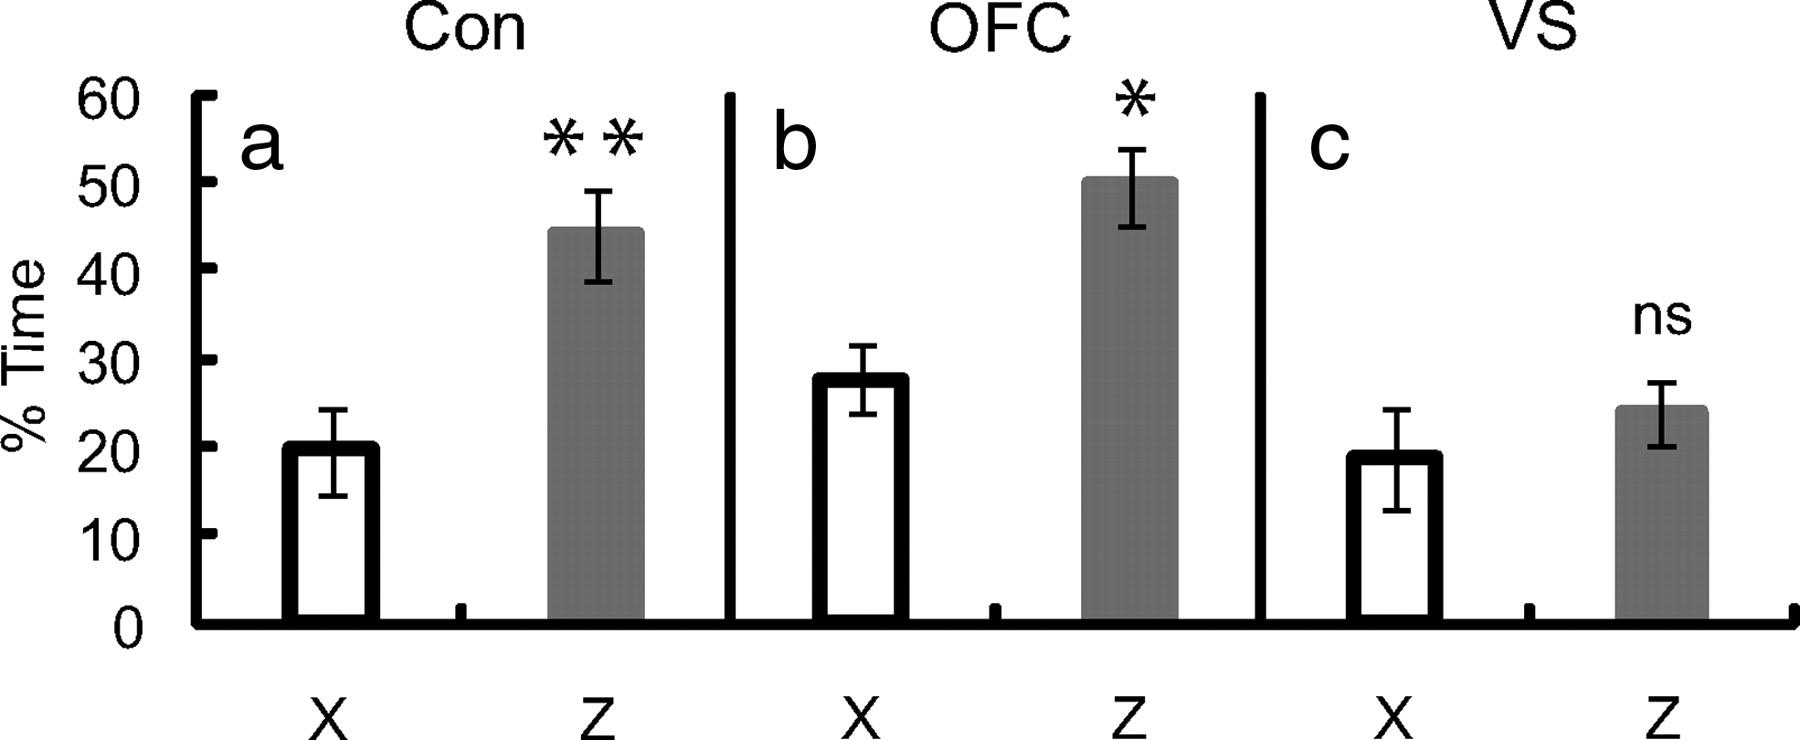 Ventral Striatum and Orbitofrontal Cortex Are Both Required for